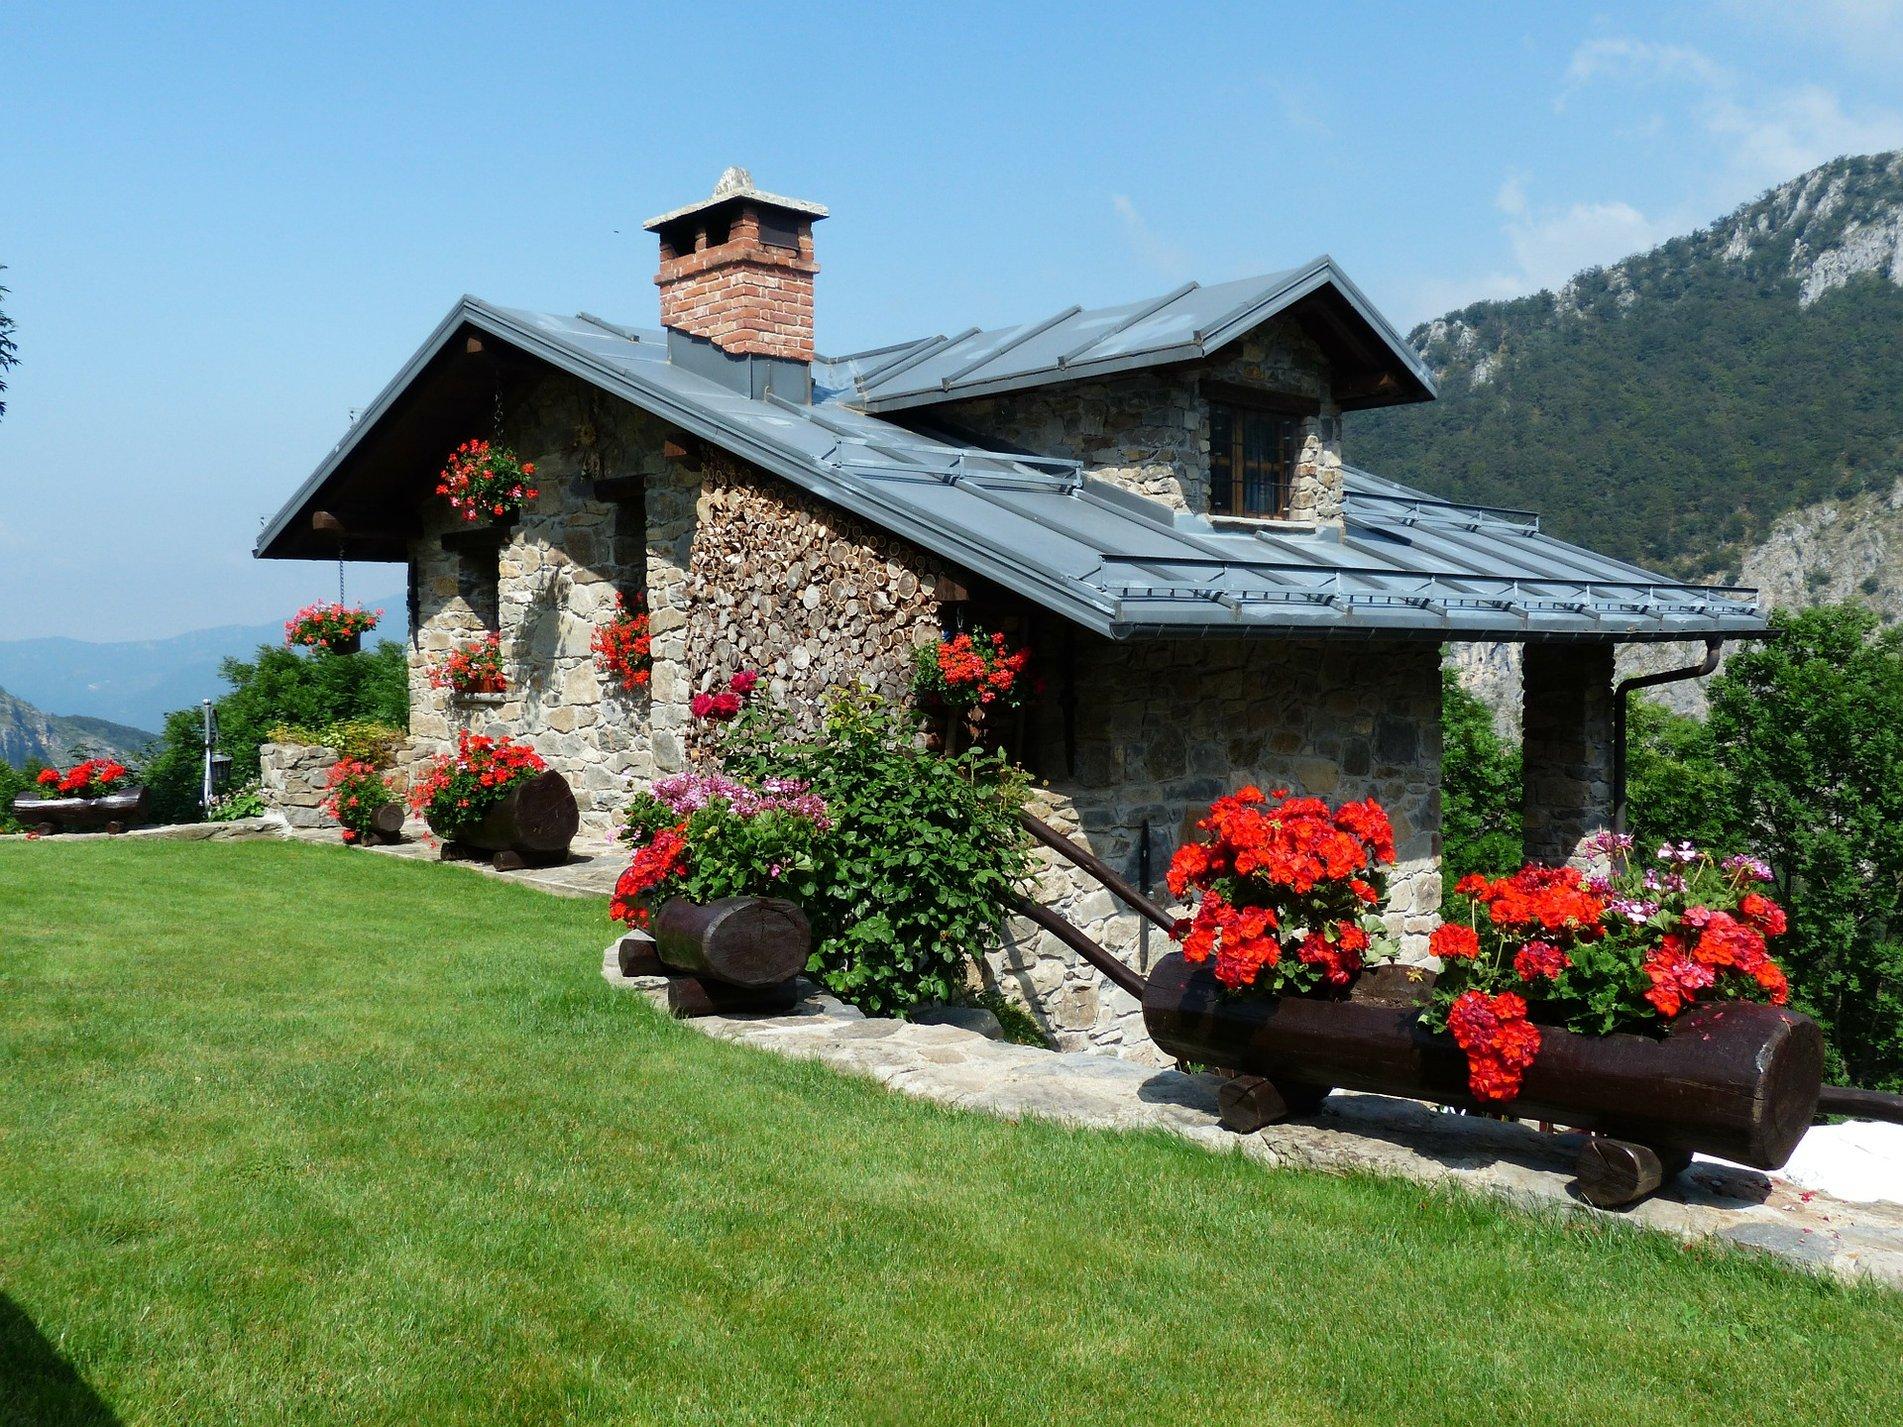 holiday-house-177401_1920.jpg